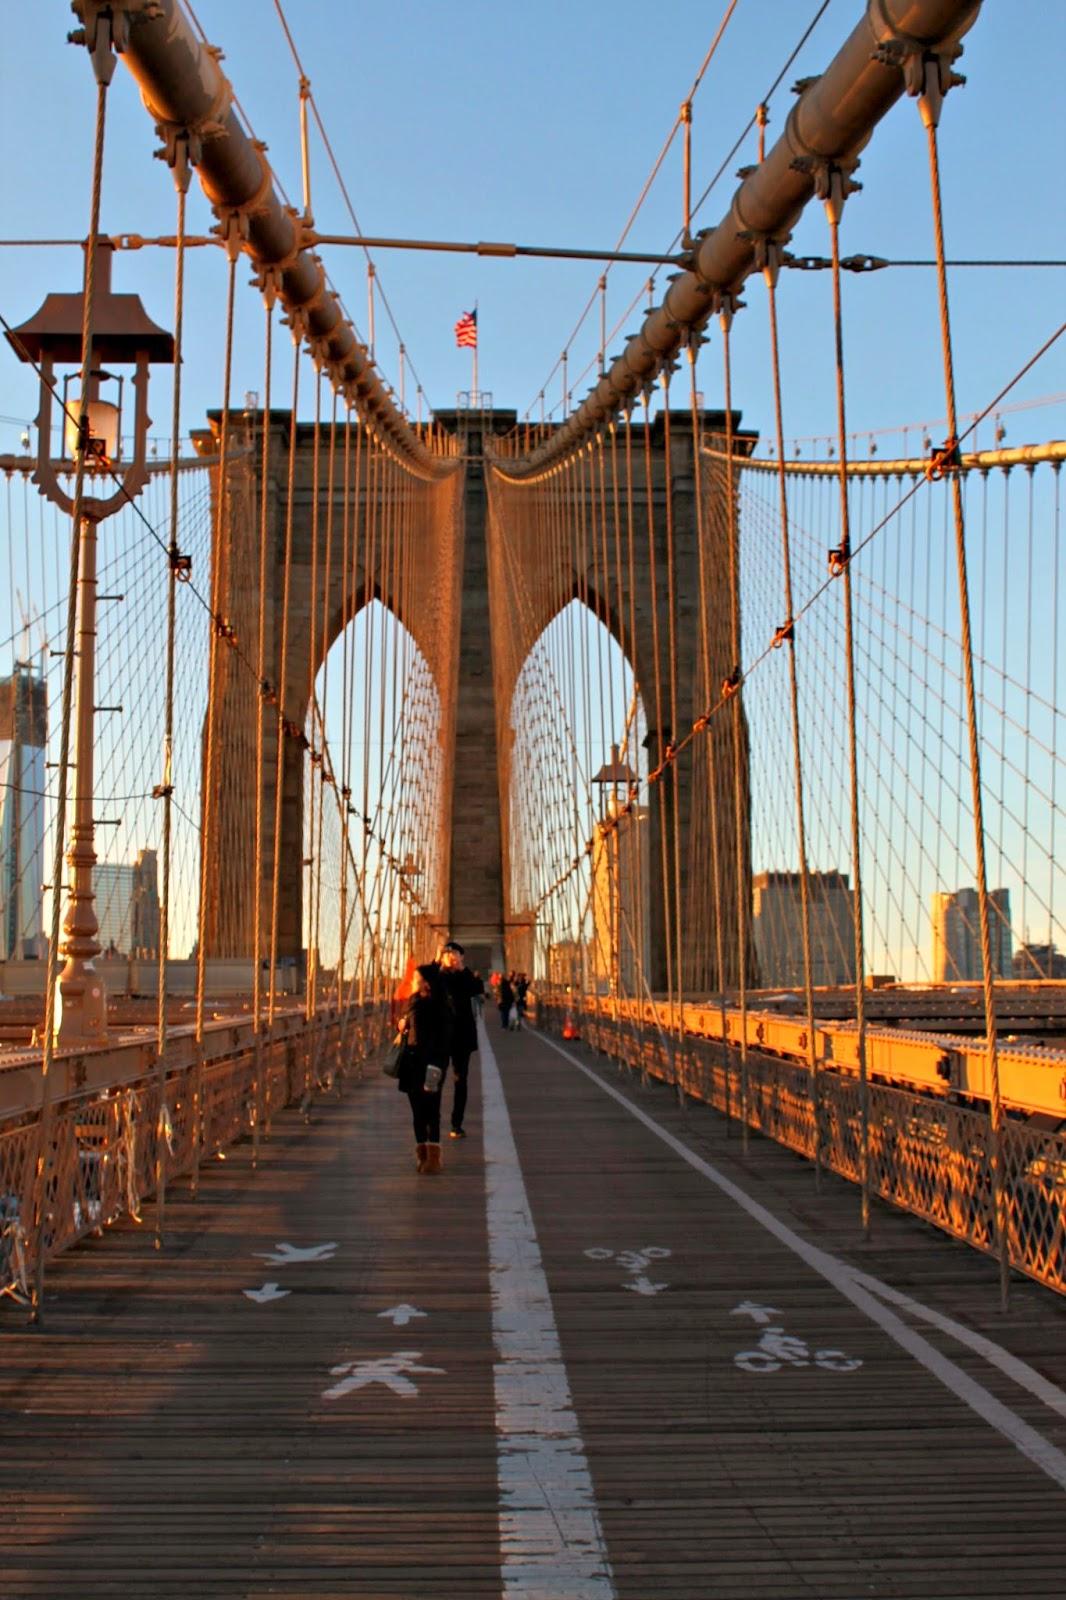 Immagini ponte di brooklyn for Disegni di ponte a 2 livelli